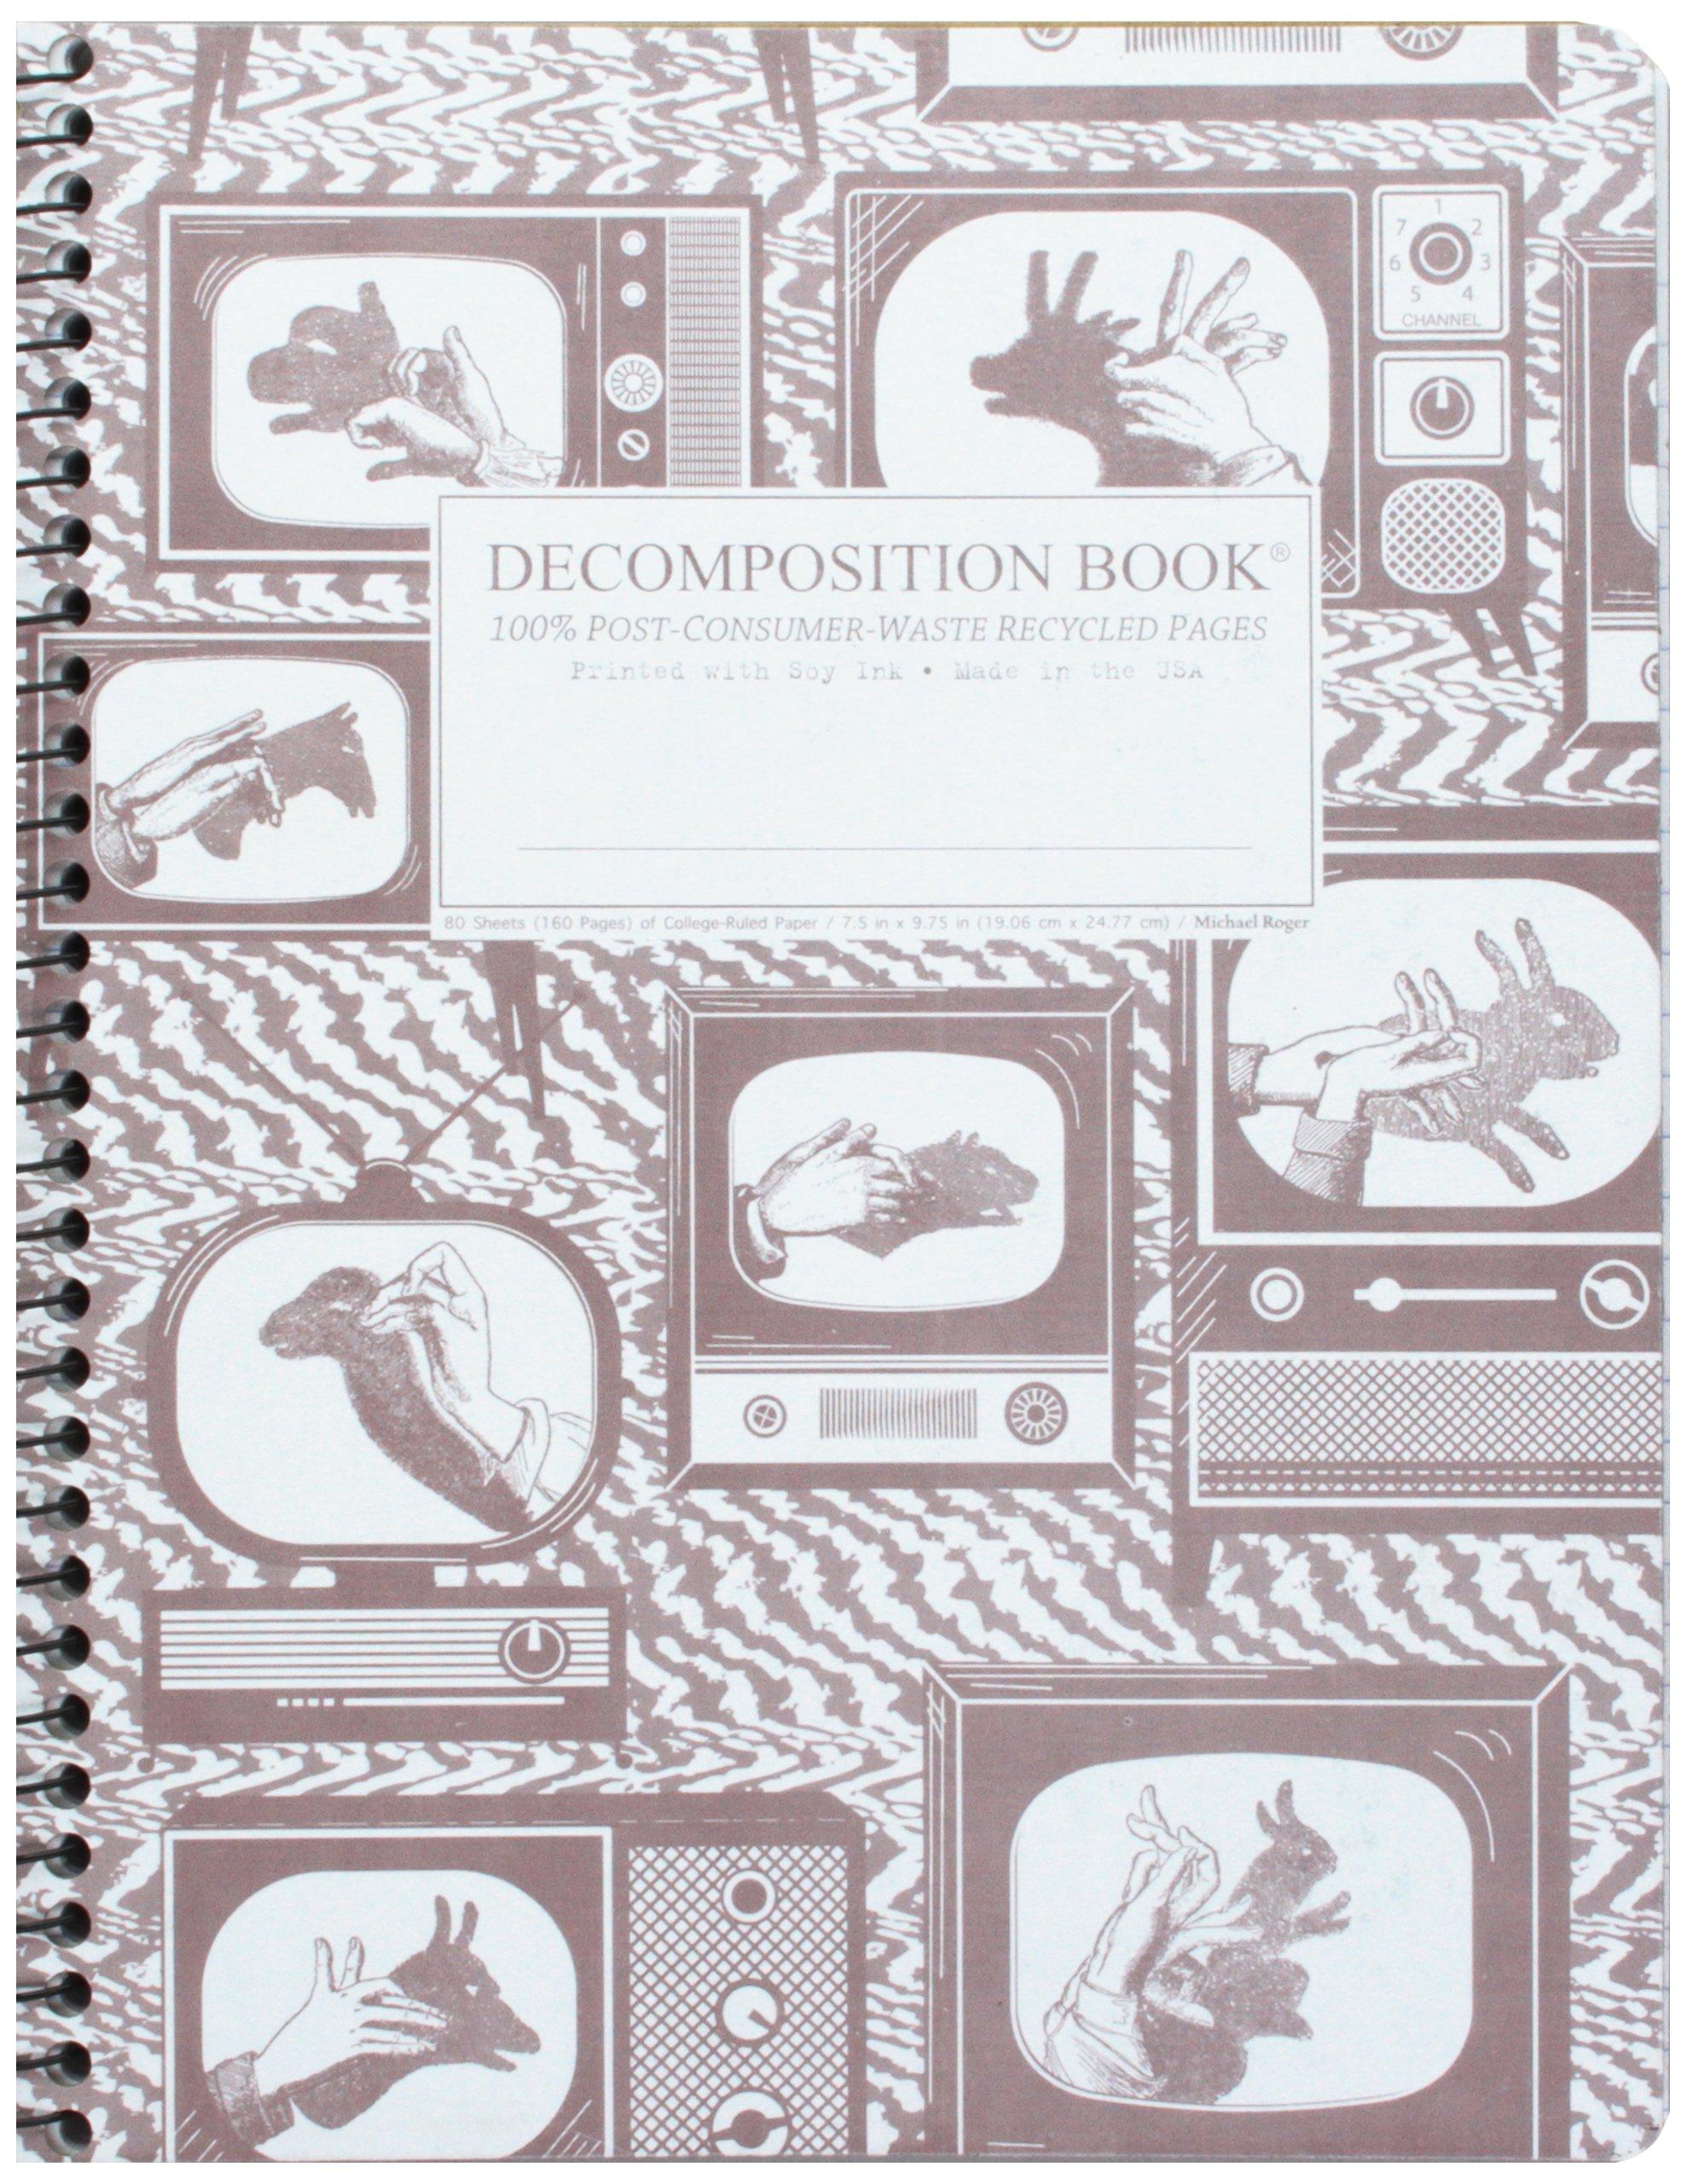 Shadow Puppets Coilbound Decomposition Book ePub fb2 ebook